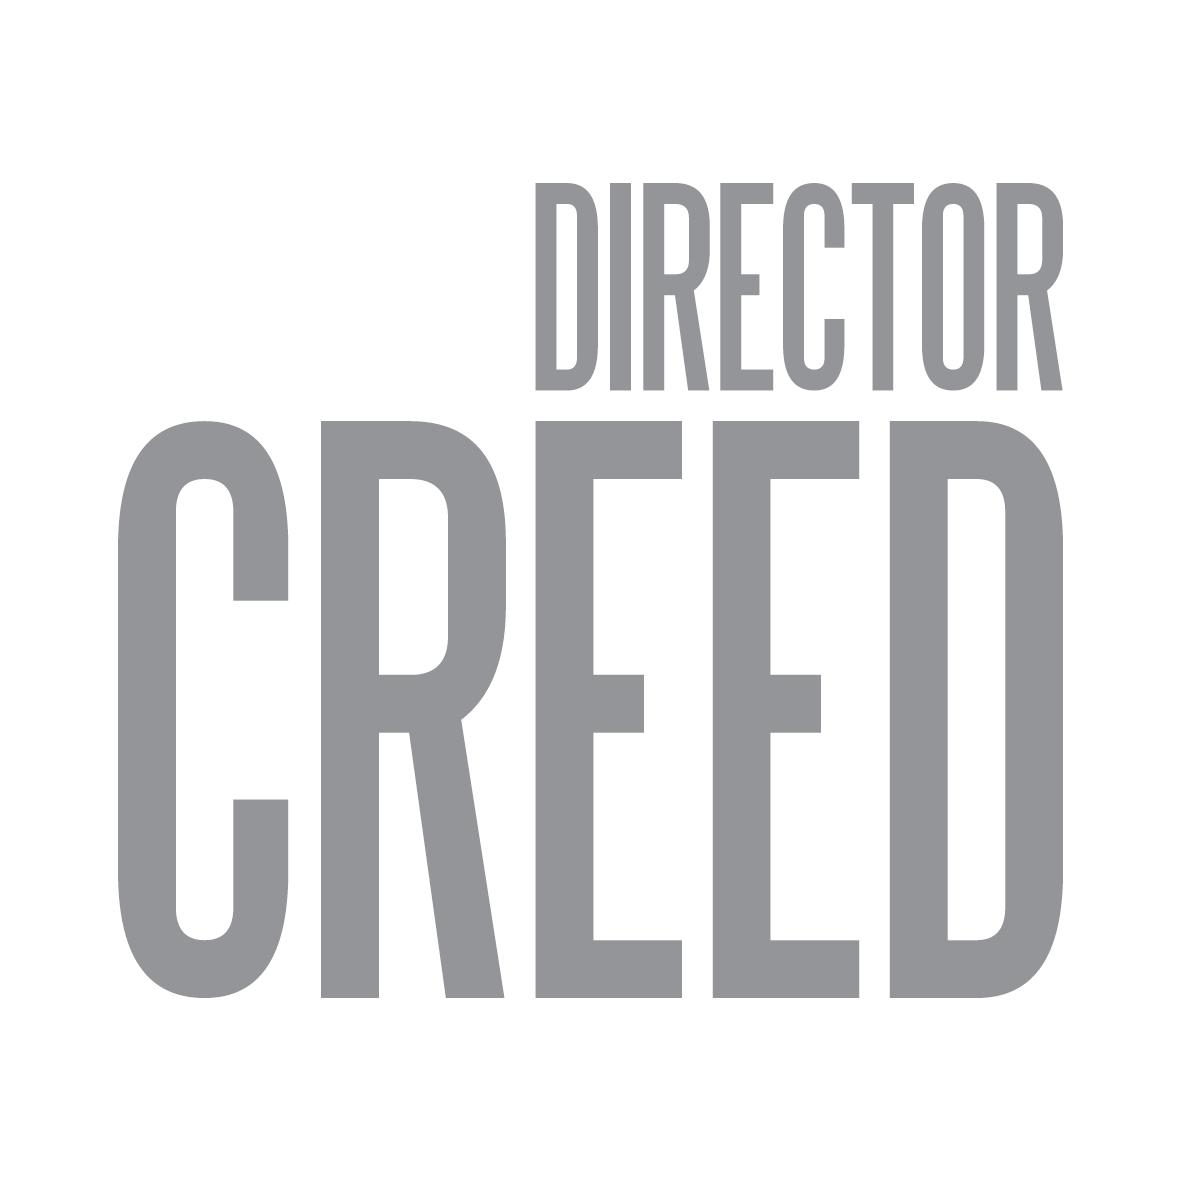 Logo - Director Creed.jpg